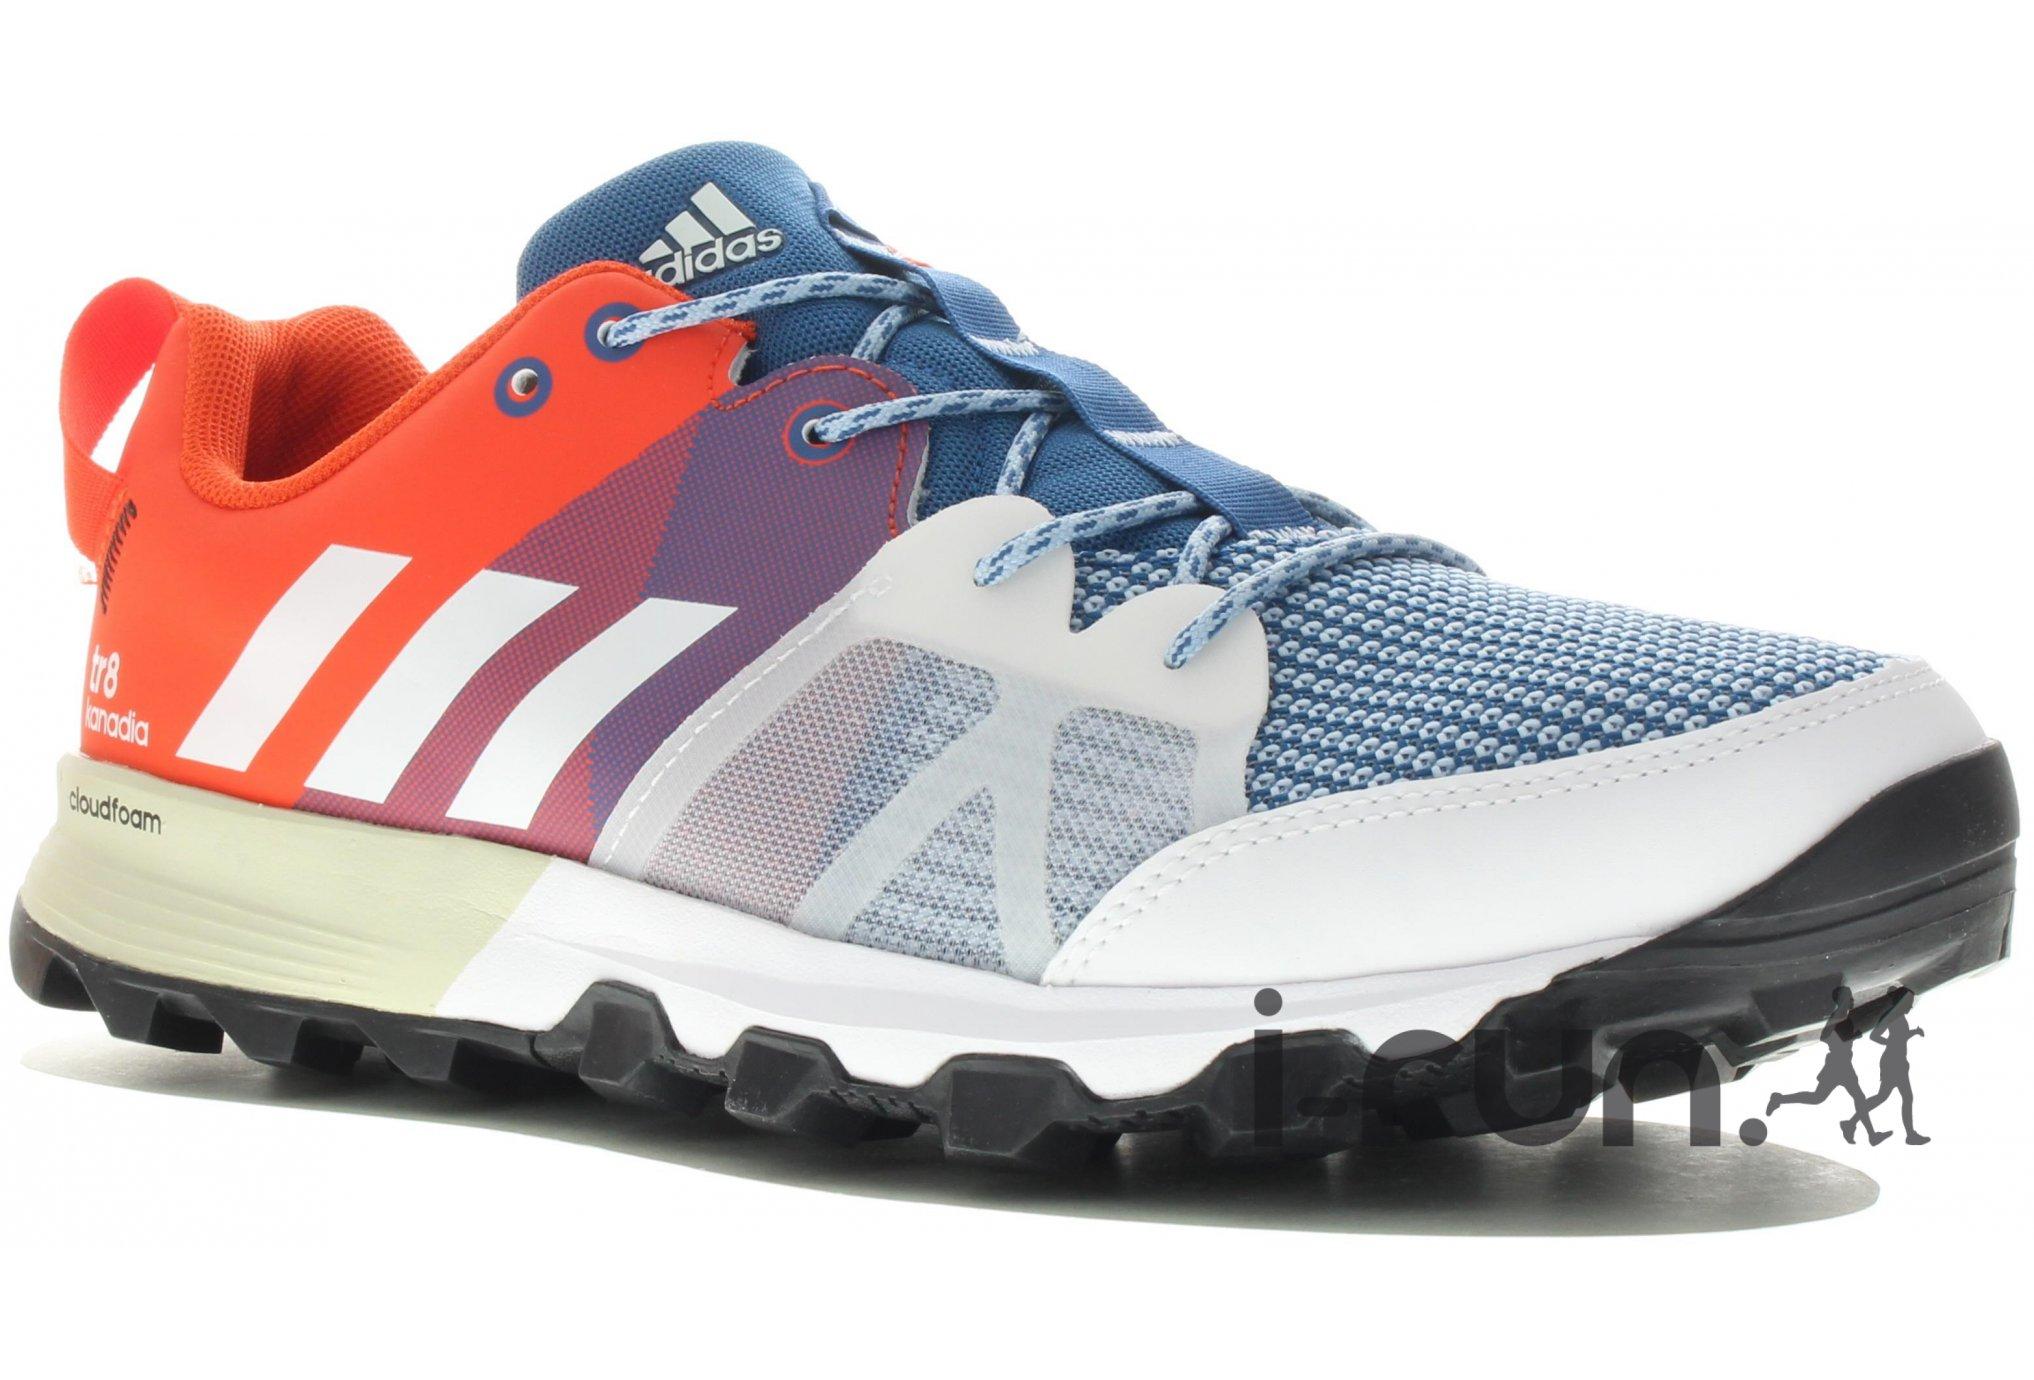 Adidas kanadia 8 tr m chaussures homme chez IRun